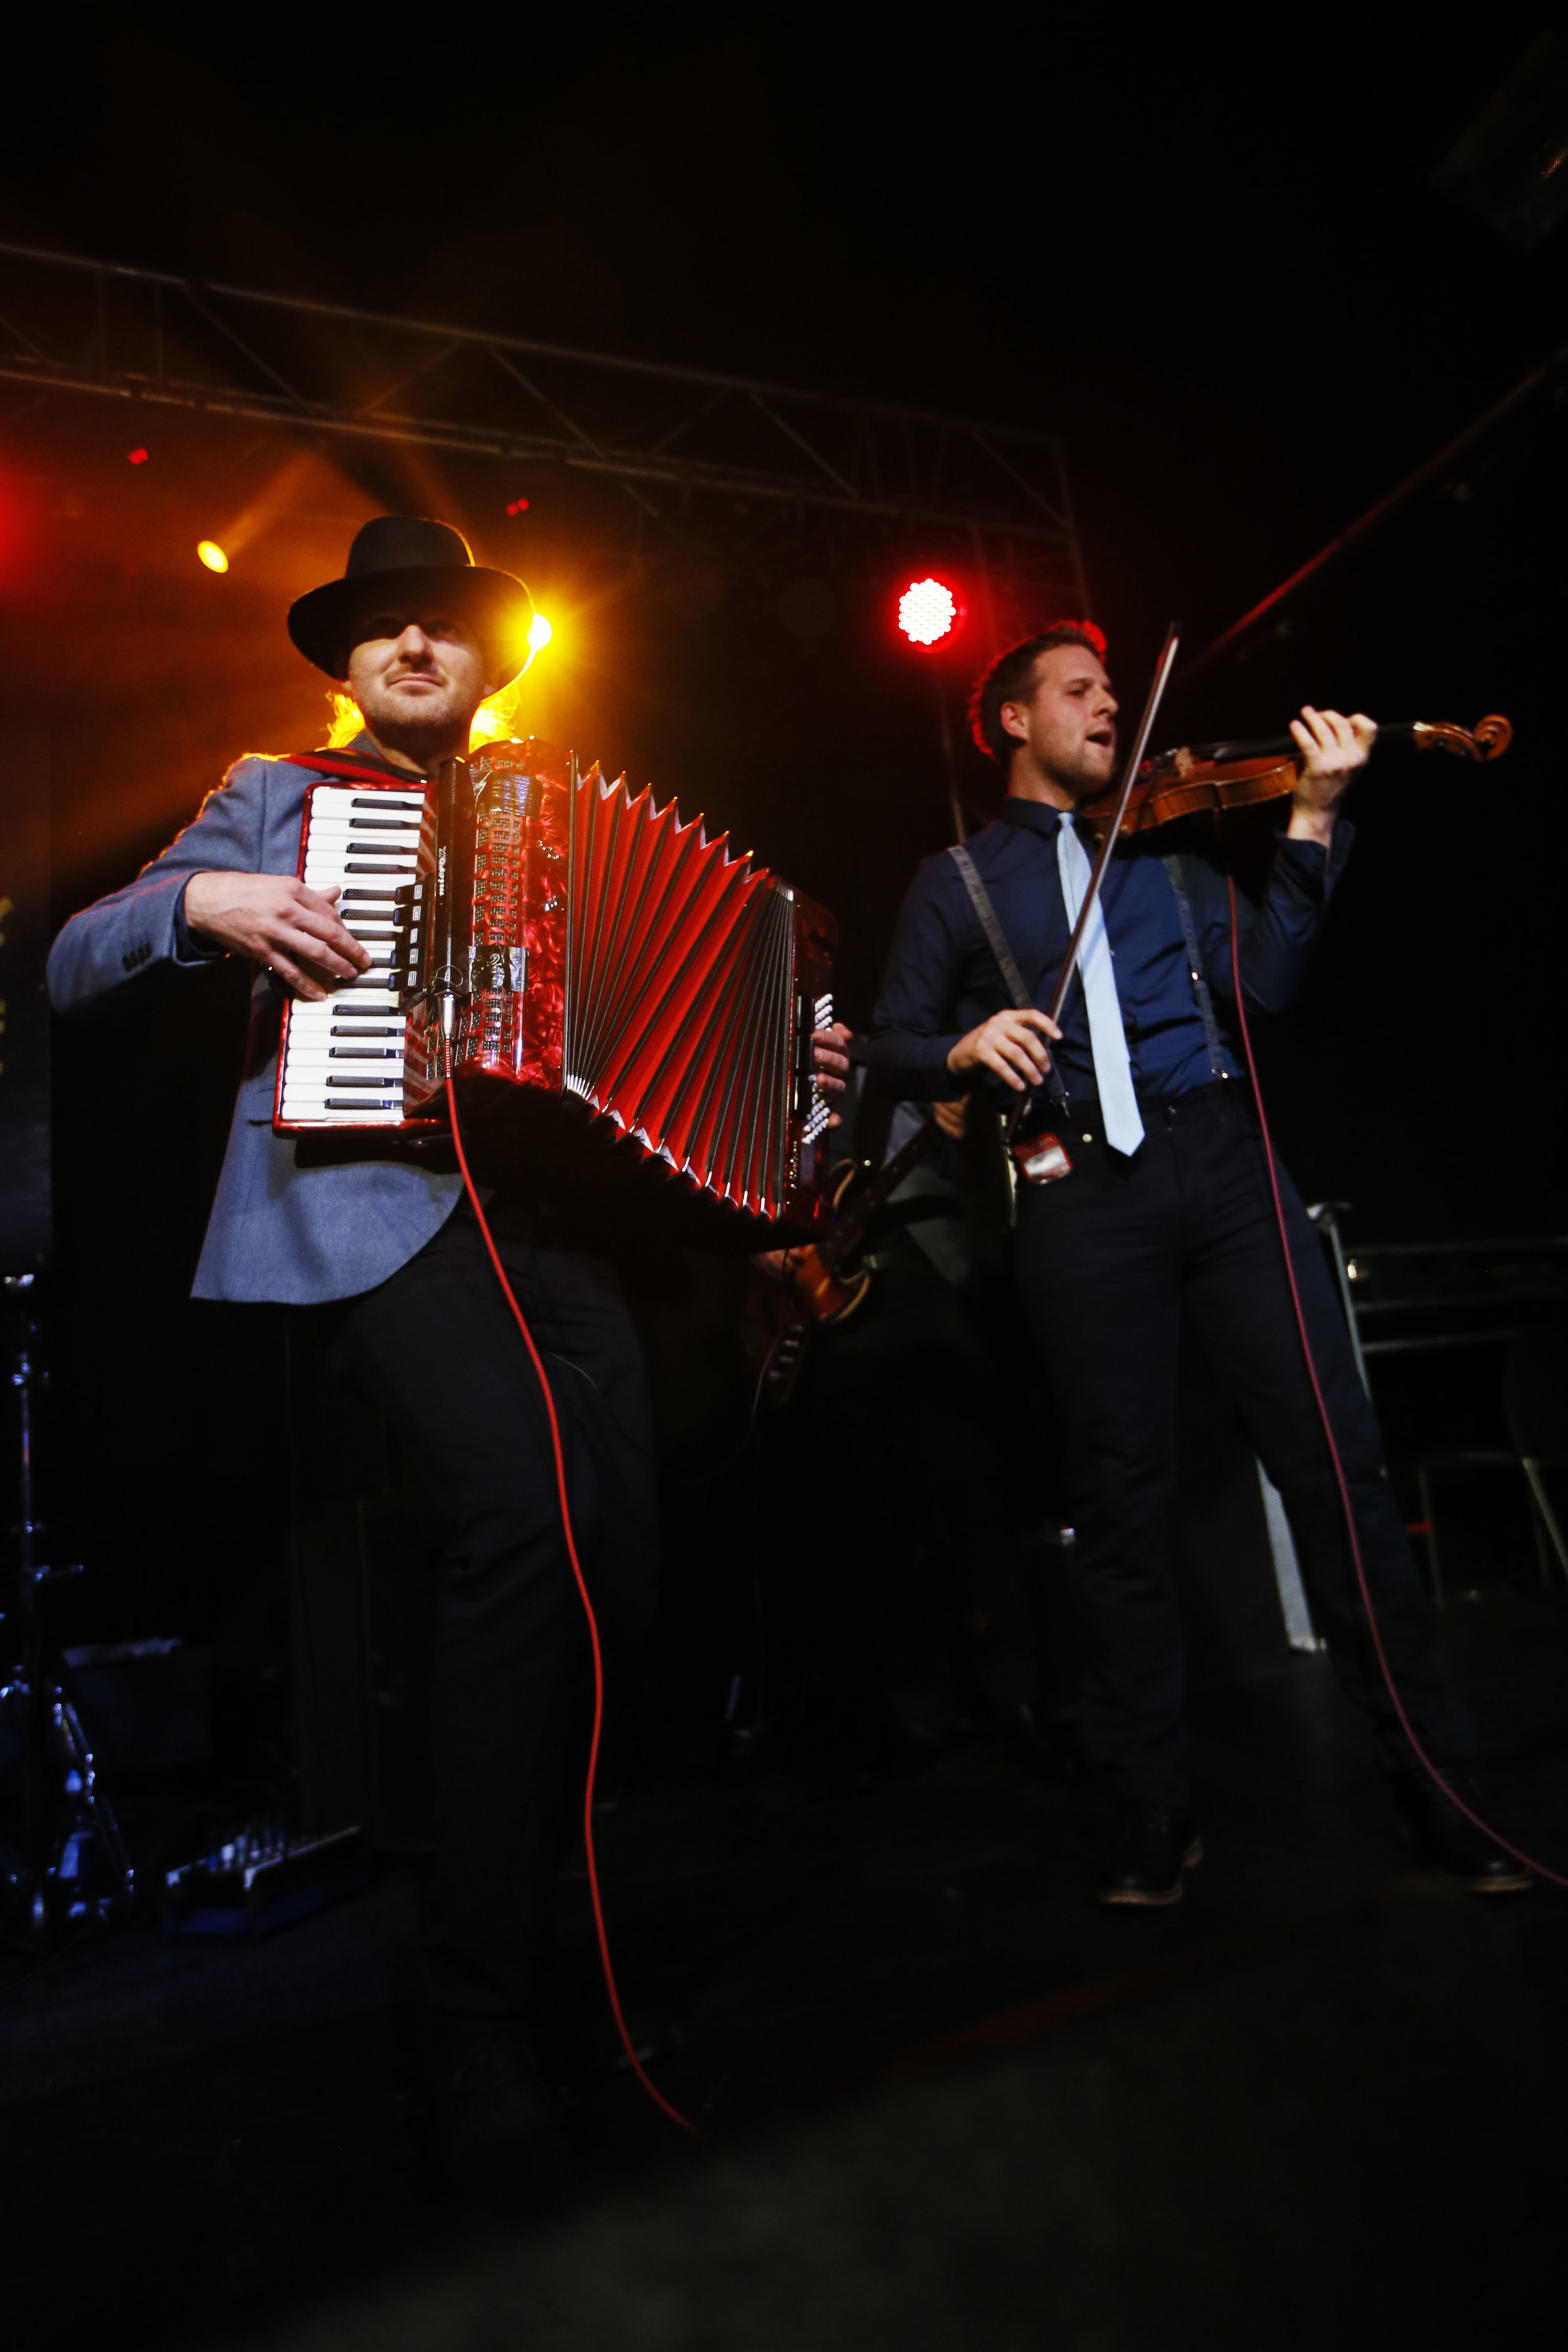 Saedly Dorus & The Hoolie Band 2015 Oxford O2 Academy0015.JPG